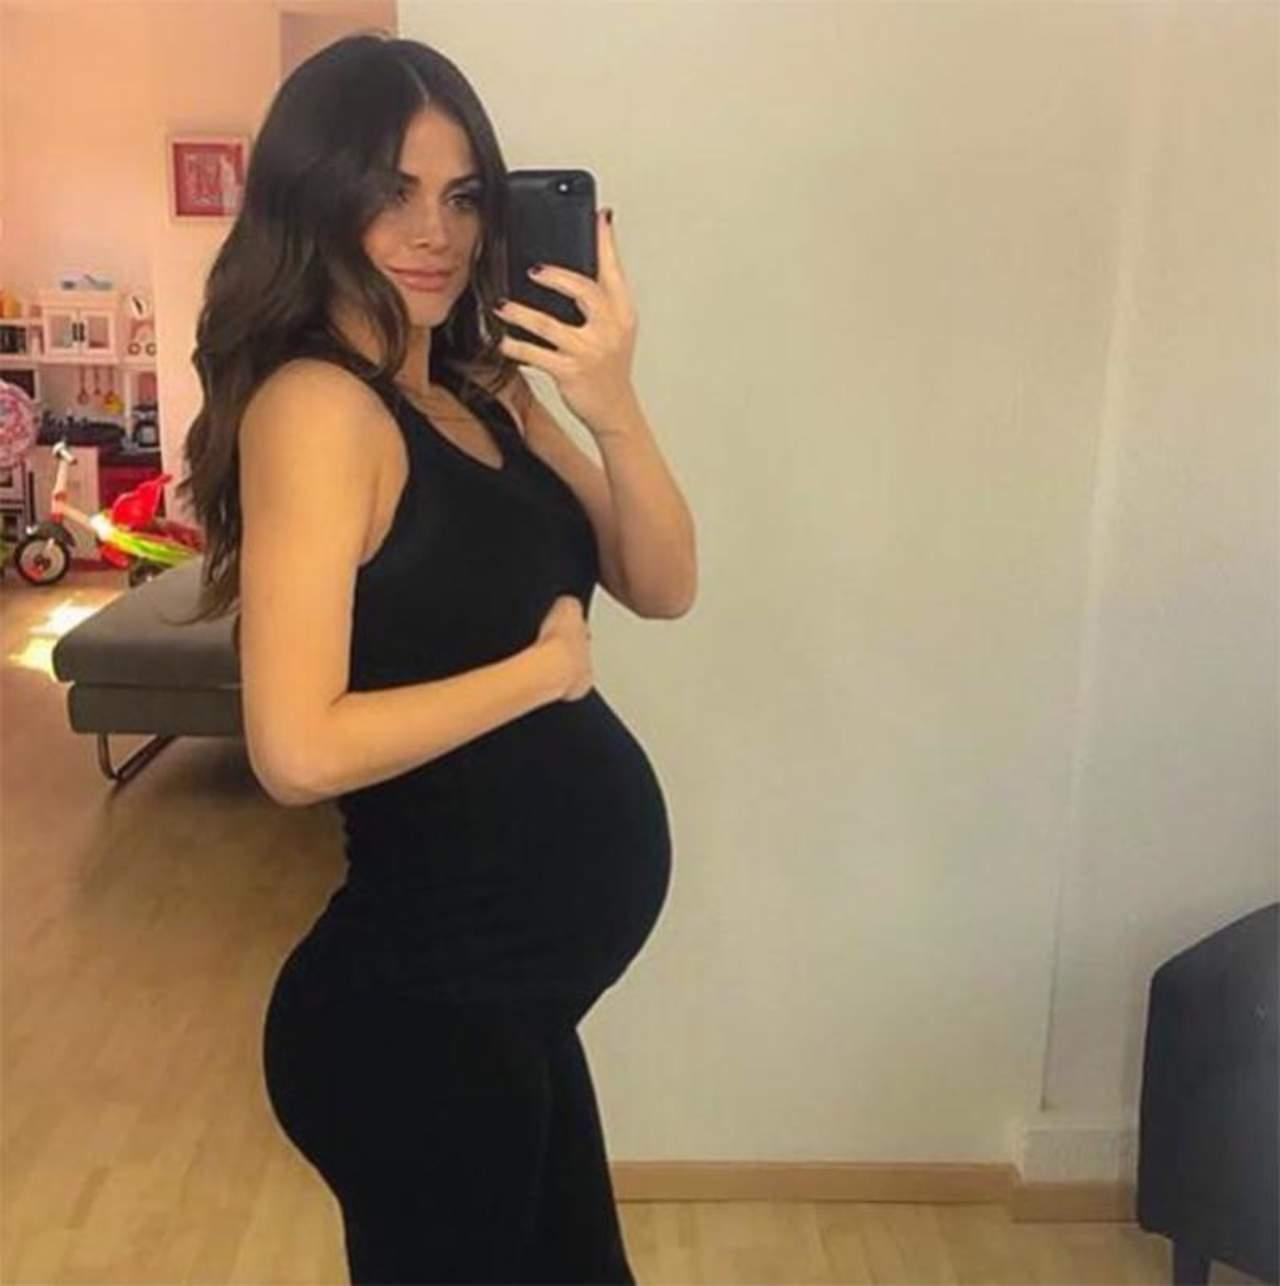 Nace la segunda hija de Marisol González